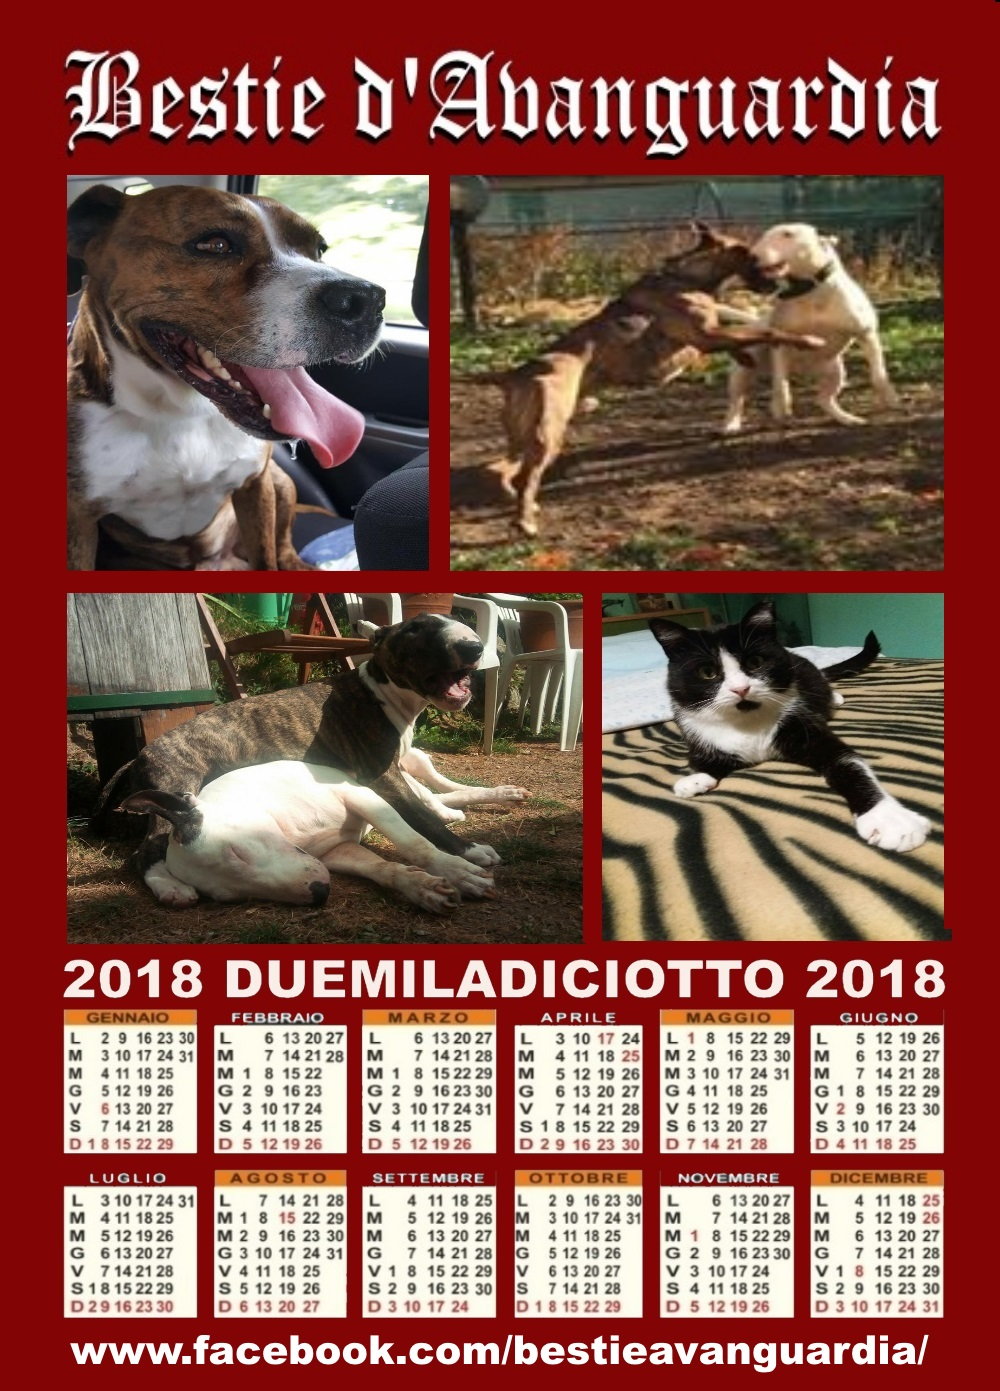 BUON 2018 DALLE BESTIE